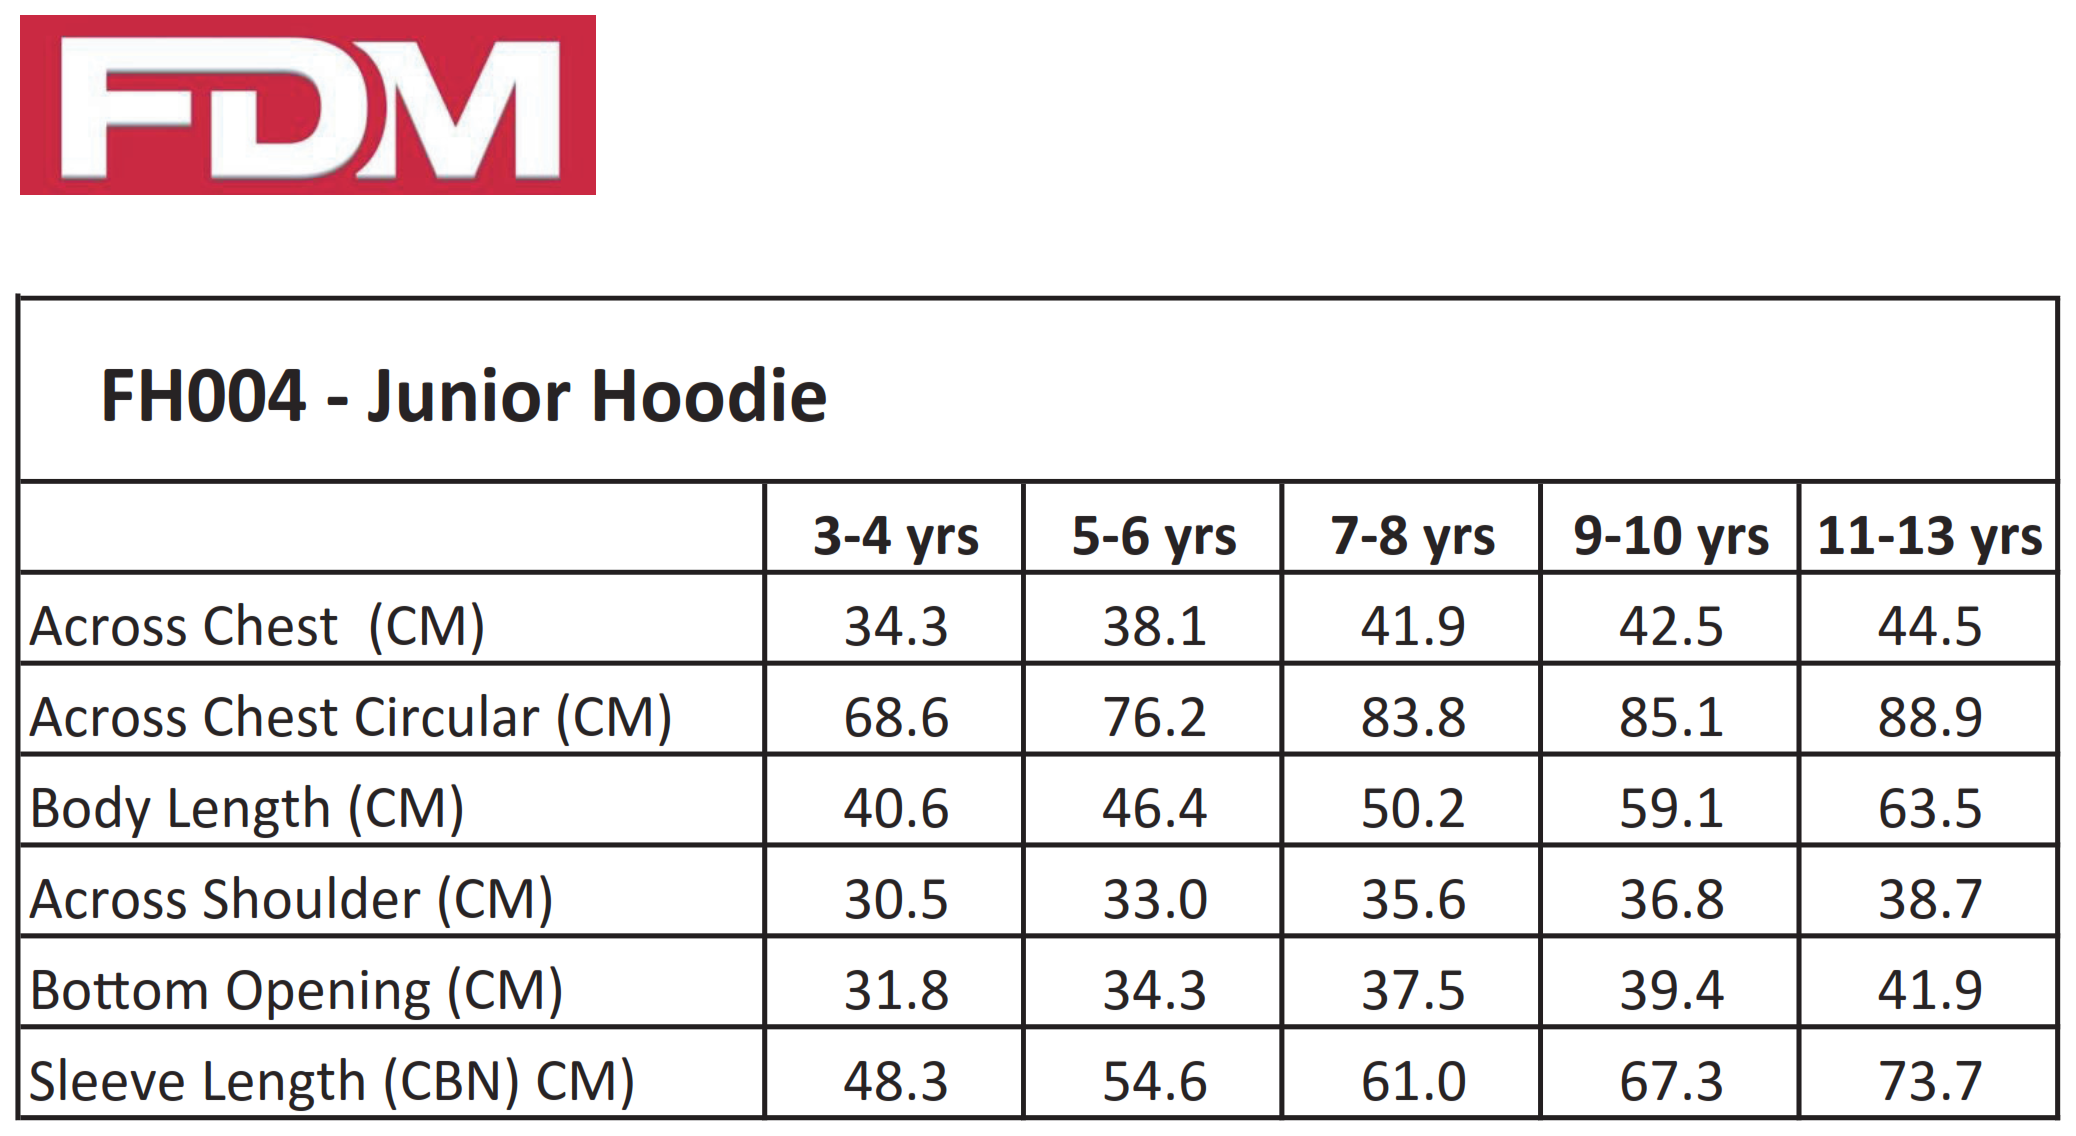 FDM: Junior Hoodie FH004